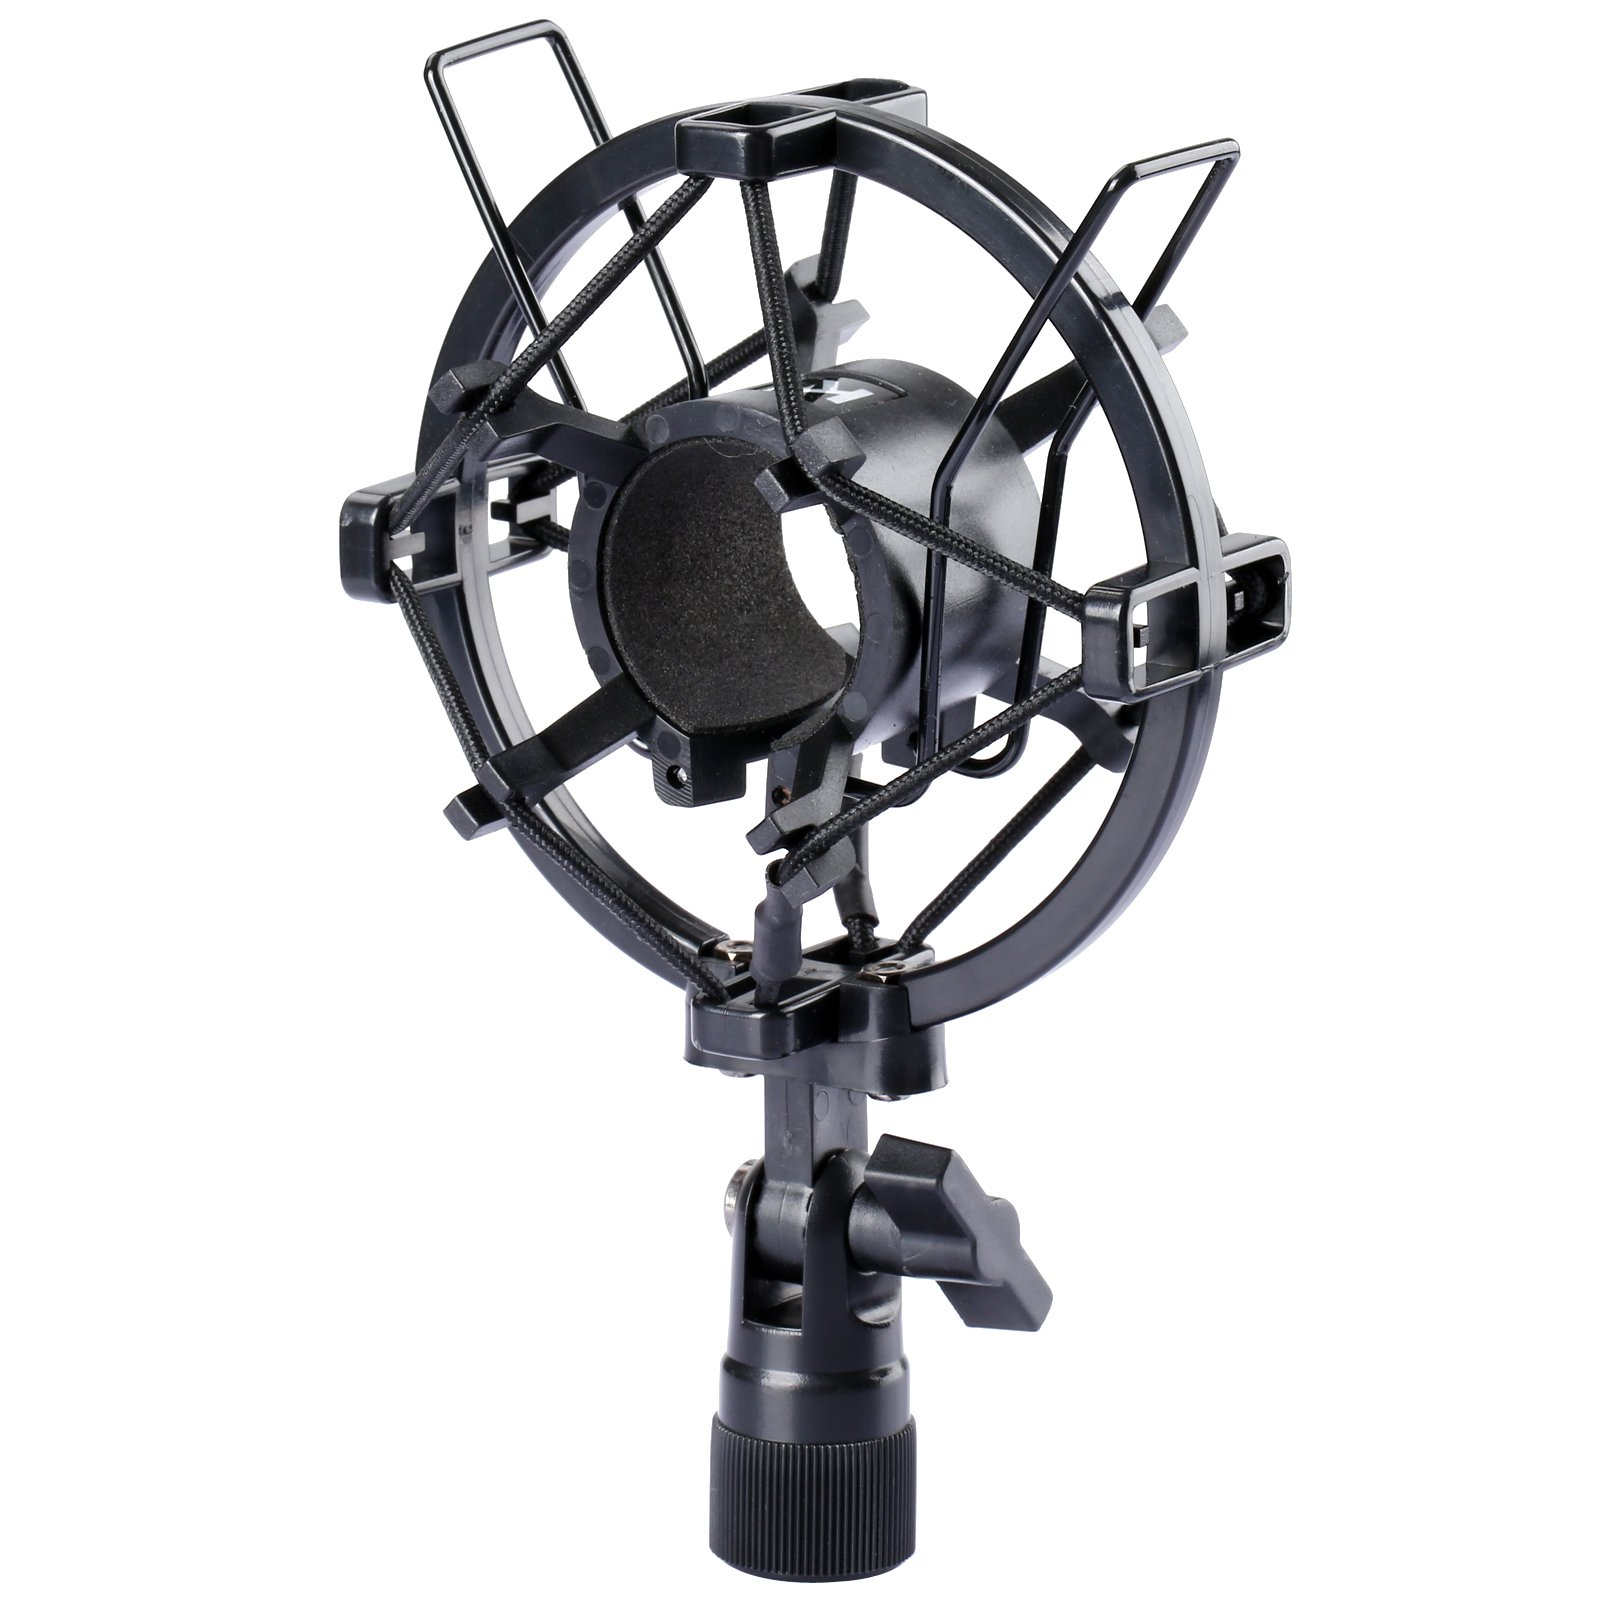 Dophee Condenser Microphone Shock Mount Stand Holder Clip Black